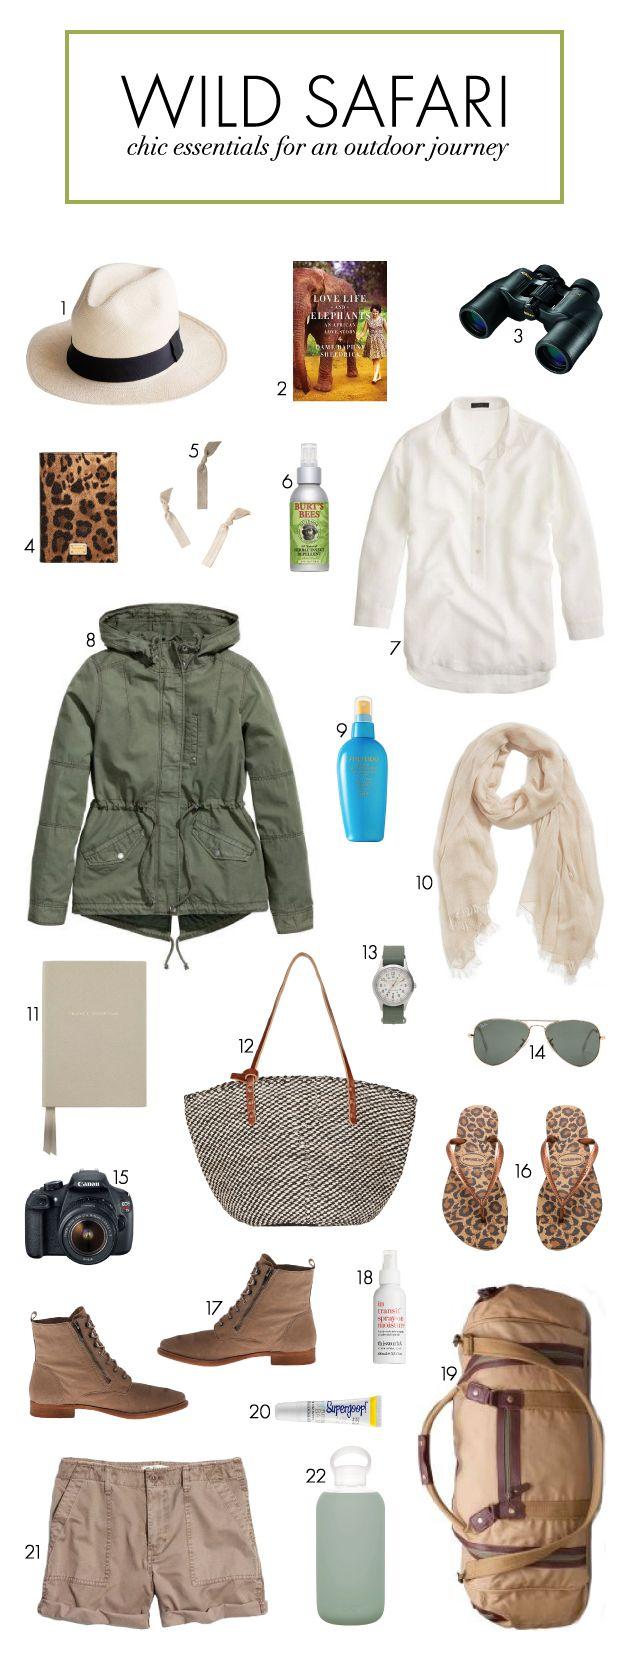 Packing Essentials for a Wild Safari | Bridal Musings Wedding Blog